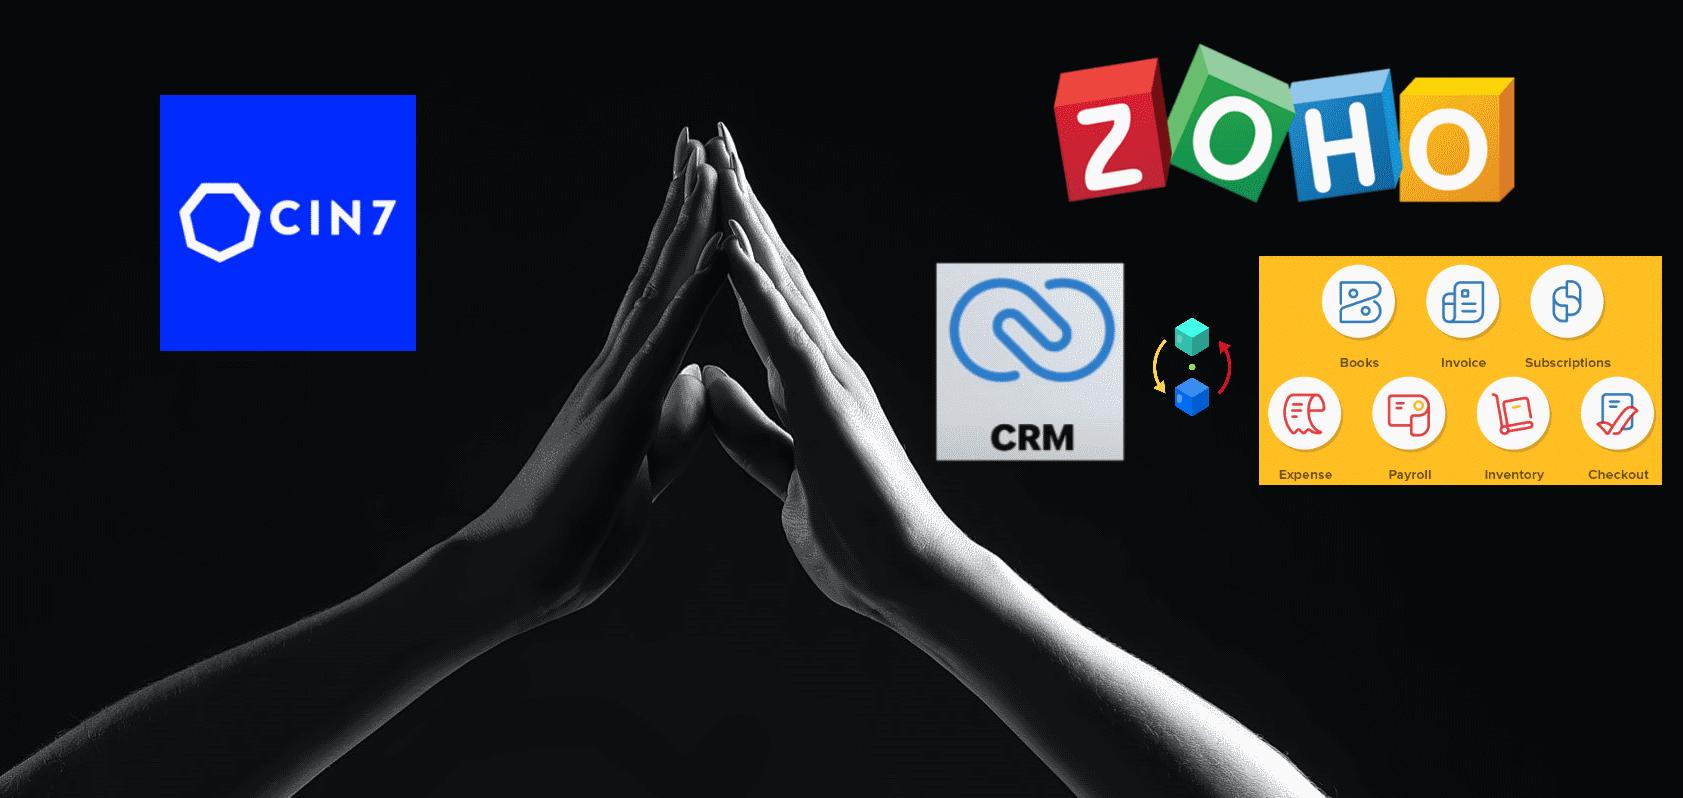 Cin7 and Zoho CRM integration